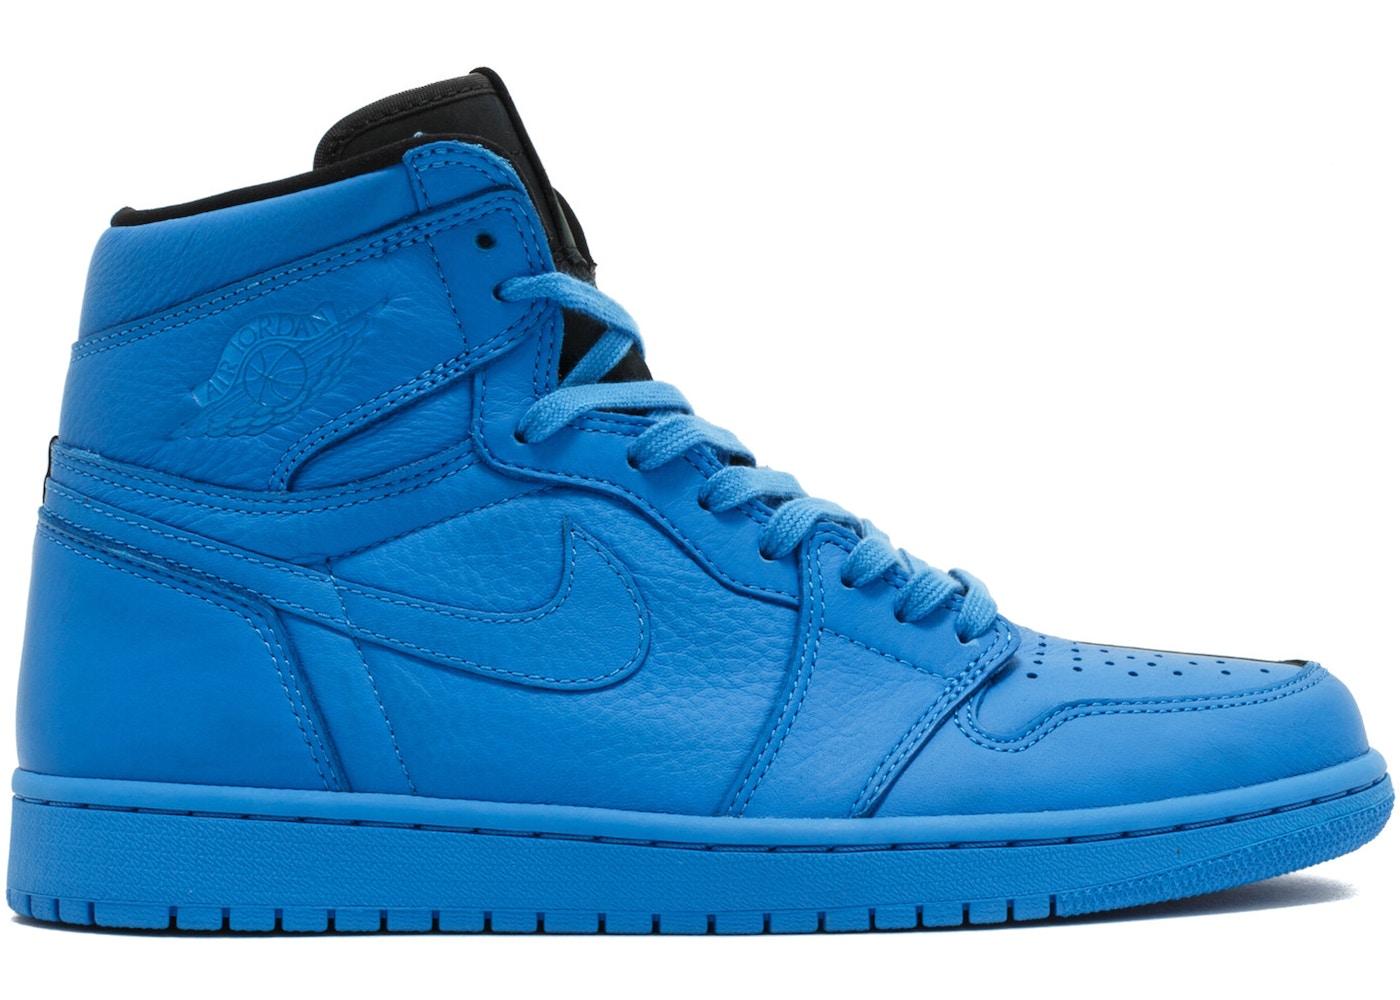 57e489f39f9 Air Jordan 1 Shoes - Average Sale Price